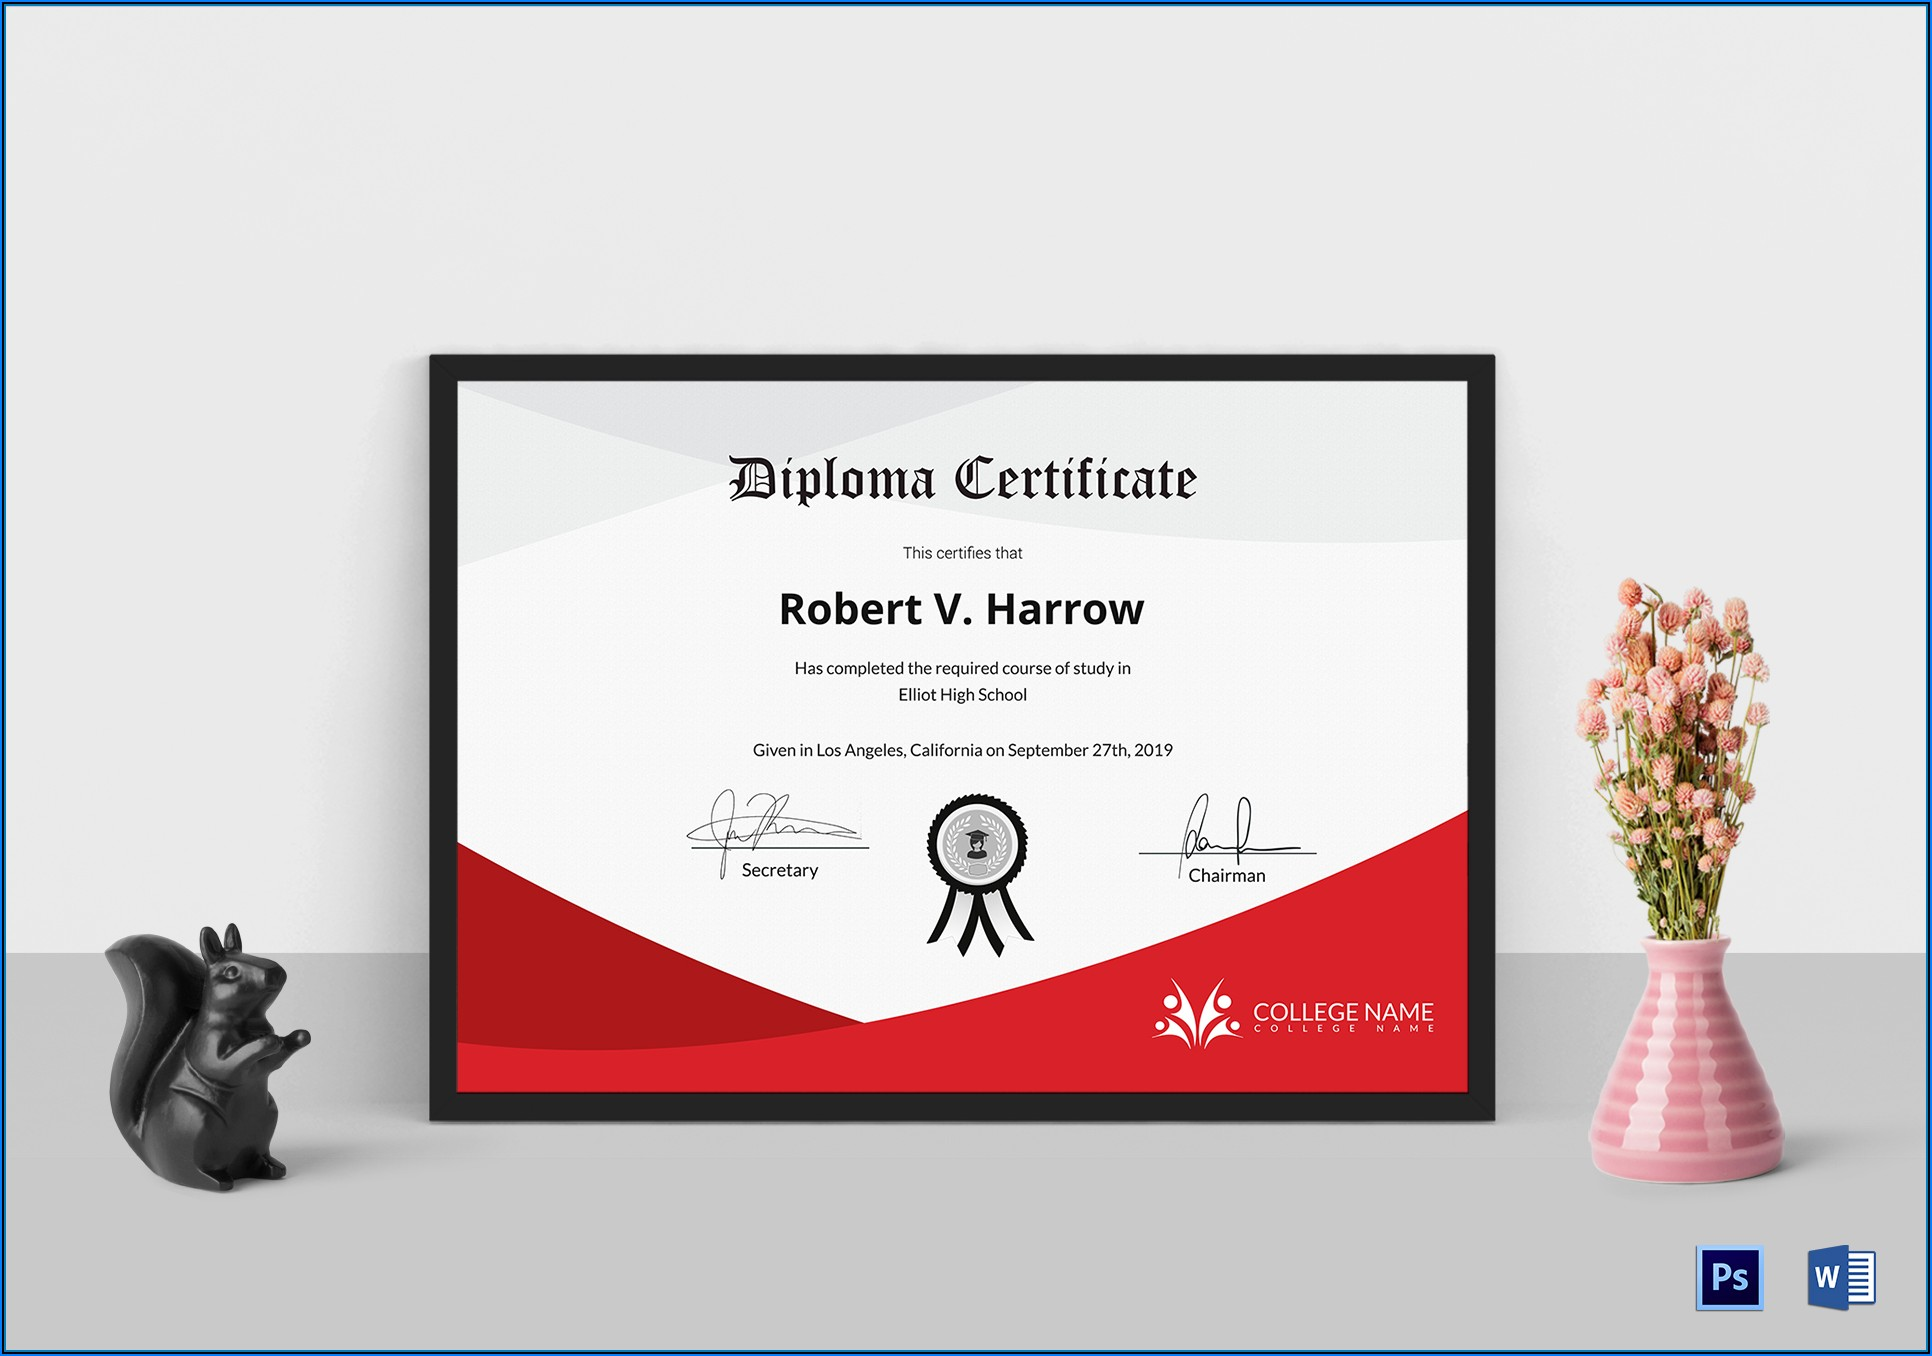 Diploma Certificate Template Psd